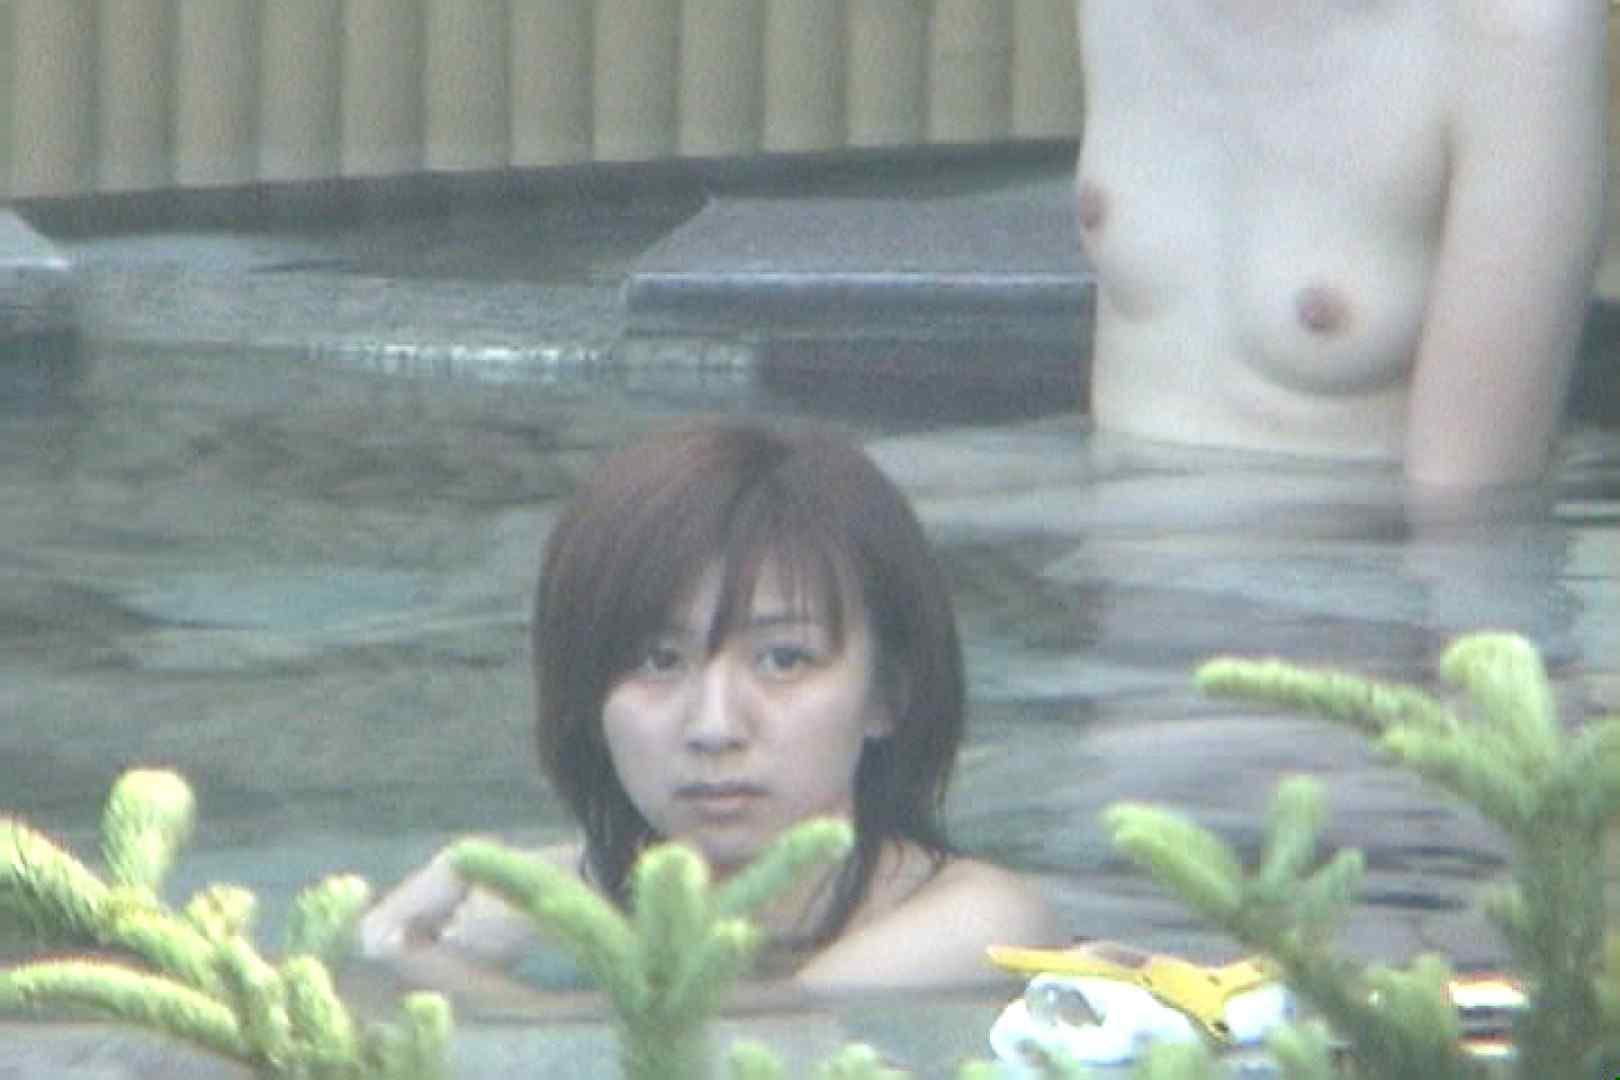 Aquaな露天風呂Vol.77【VIP限定】 露天風呂編  100PIX 74